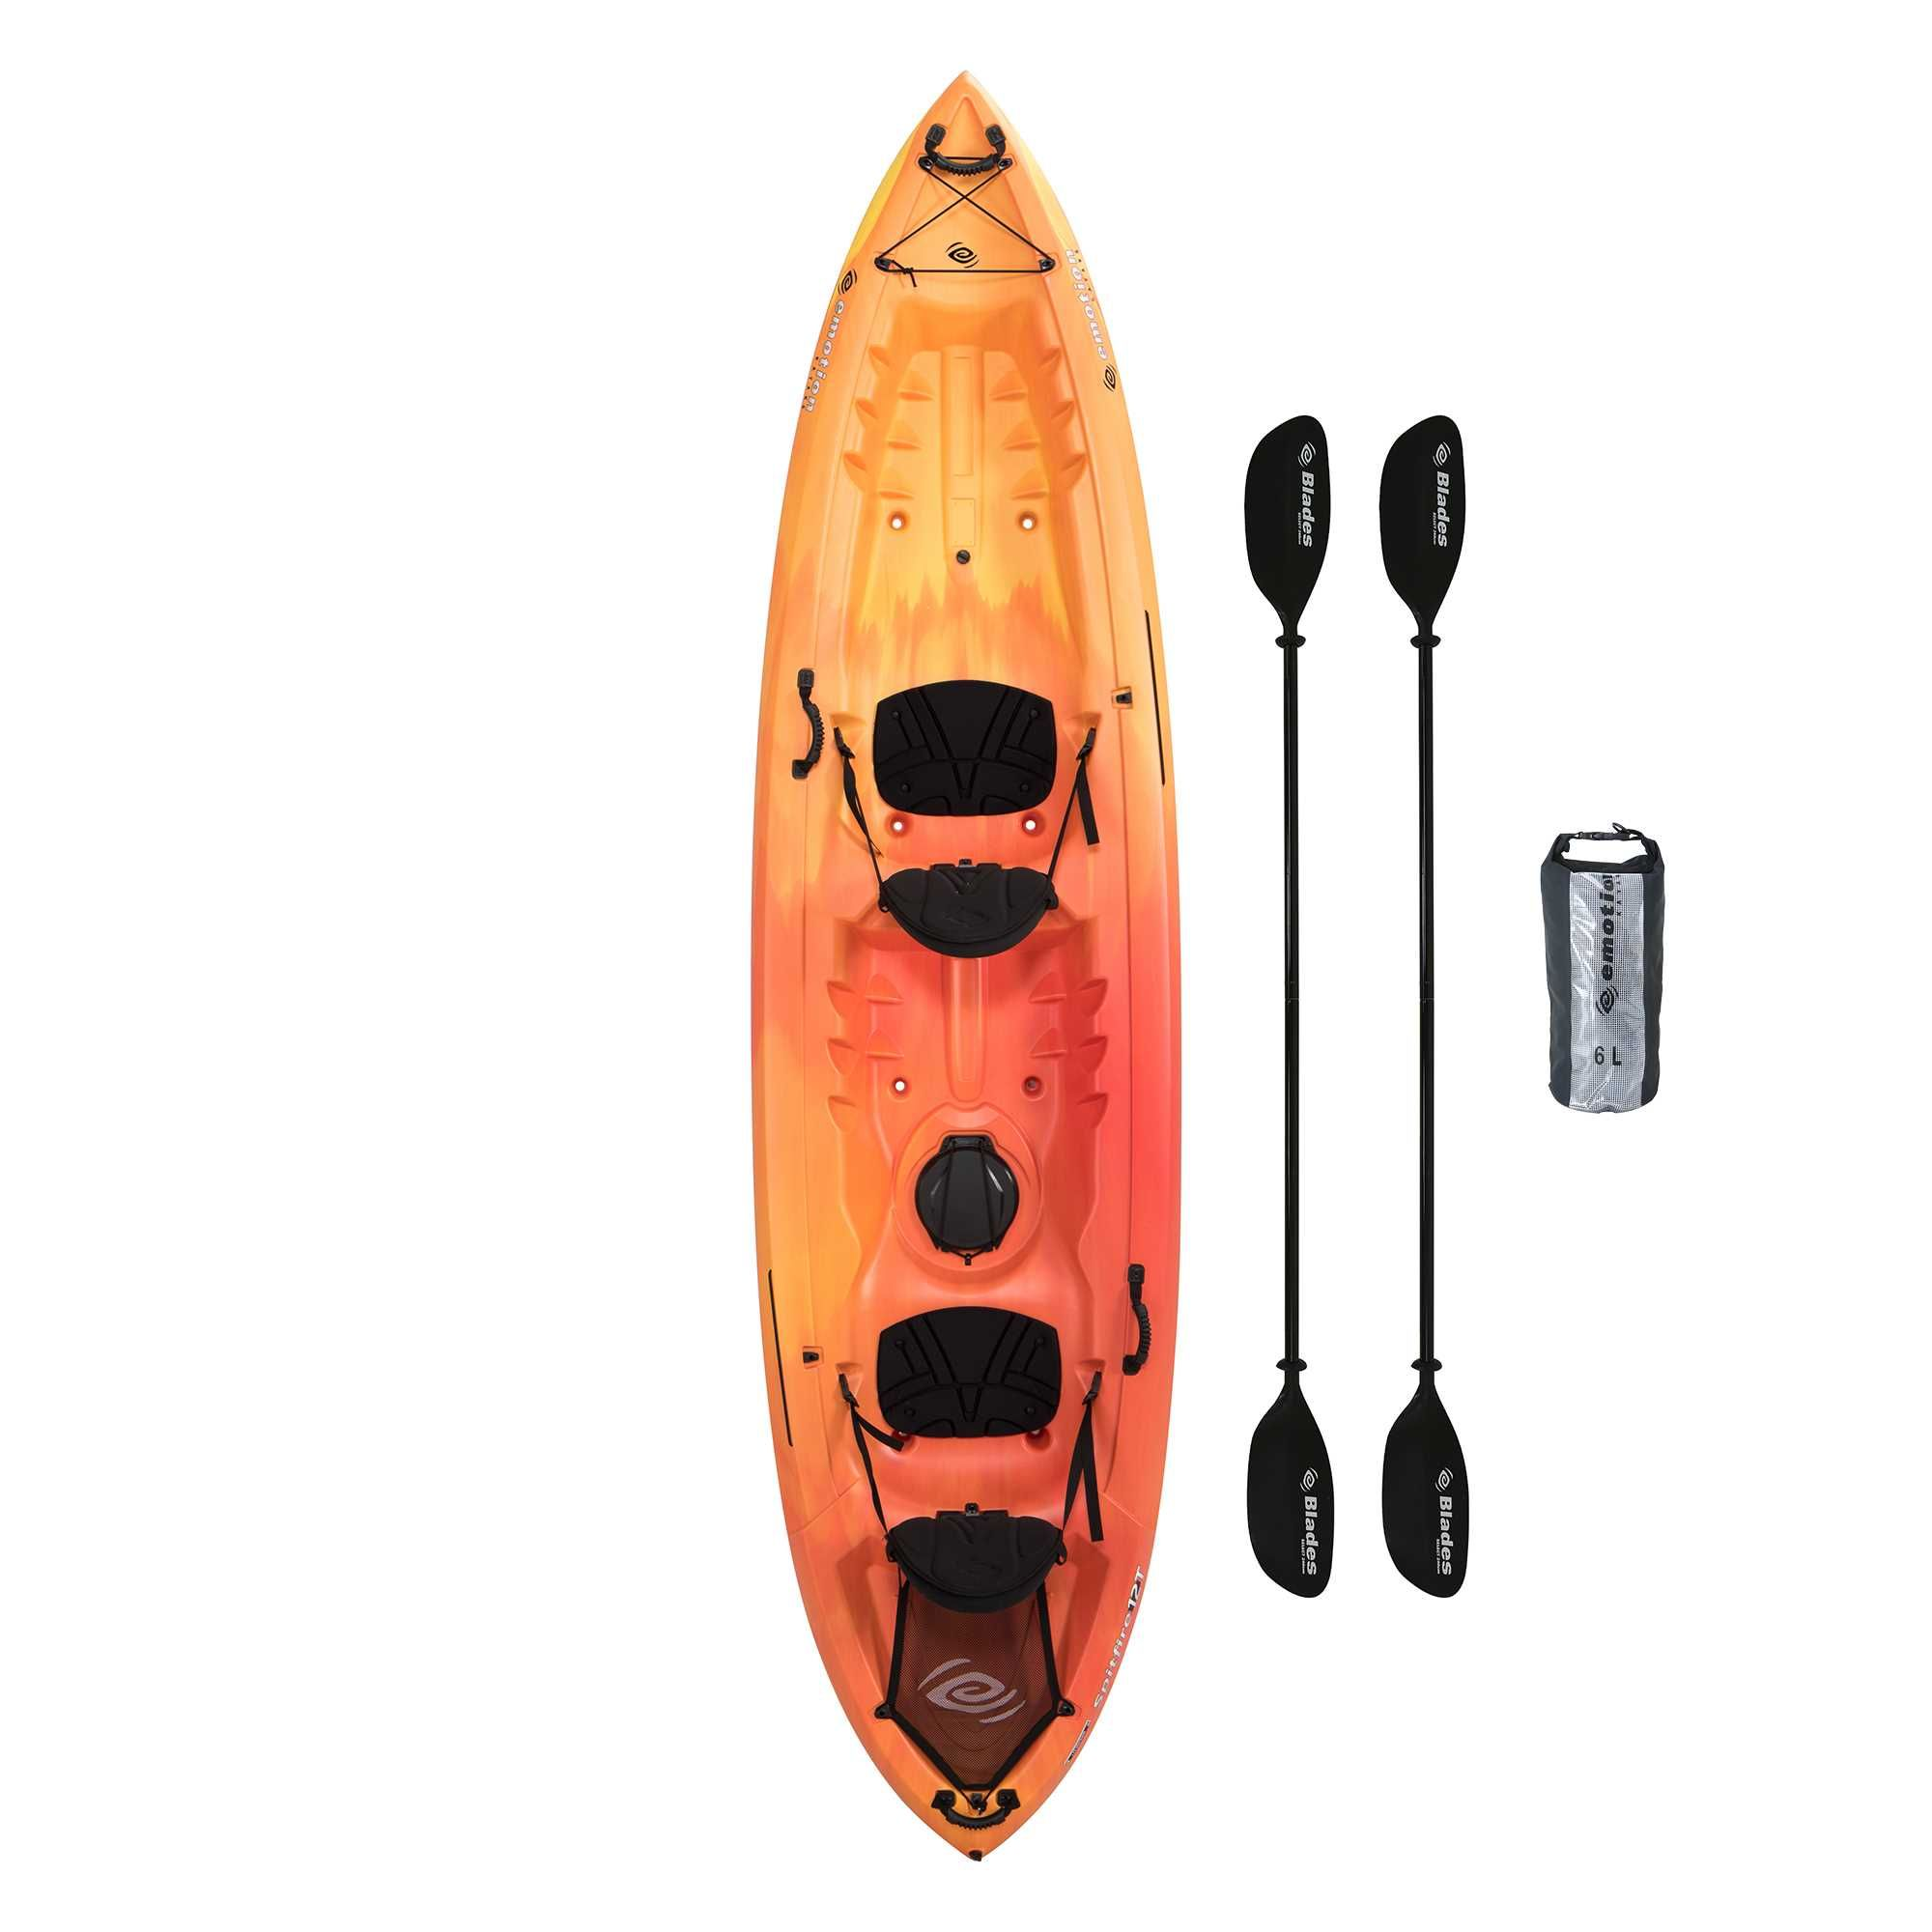 2 Person Kayak Costco >> Lifetime Emotion Spitfire 12 Tandem Sit On Kayak